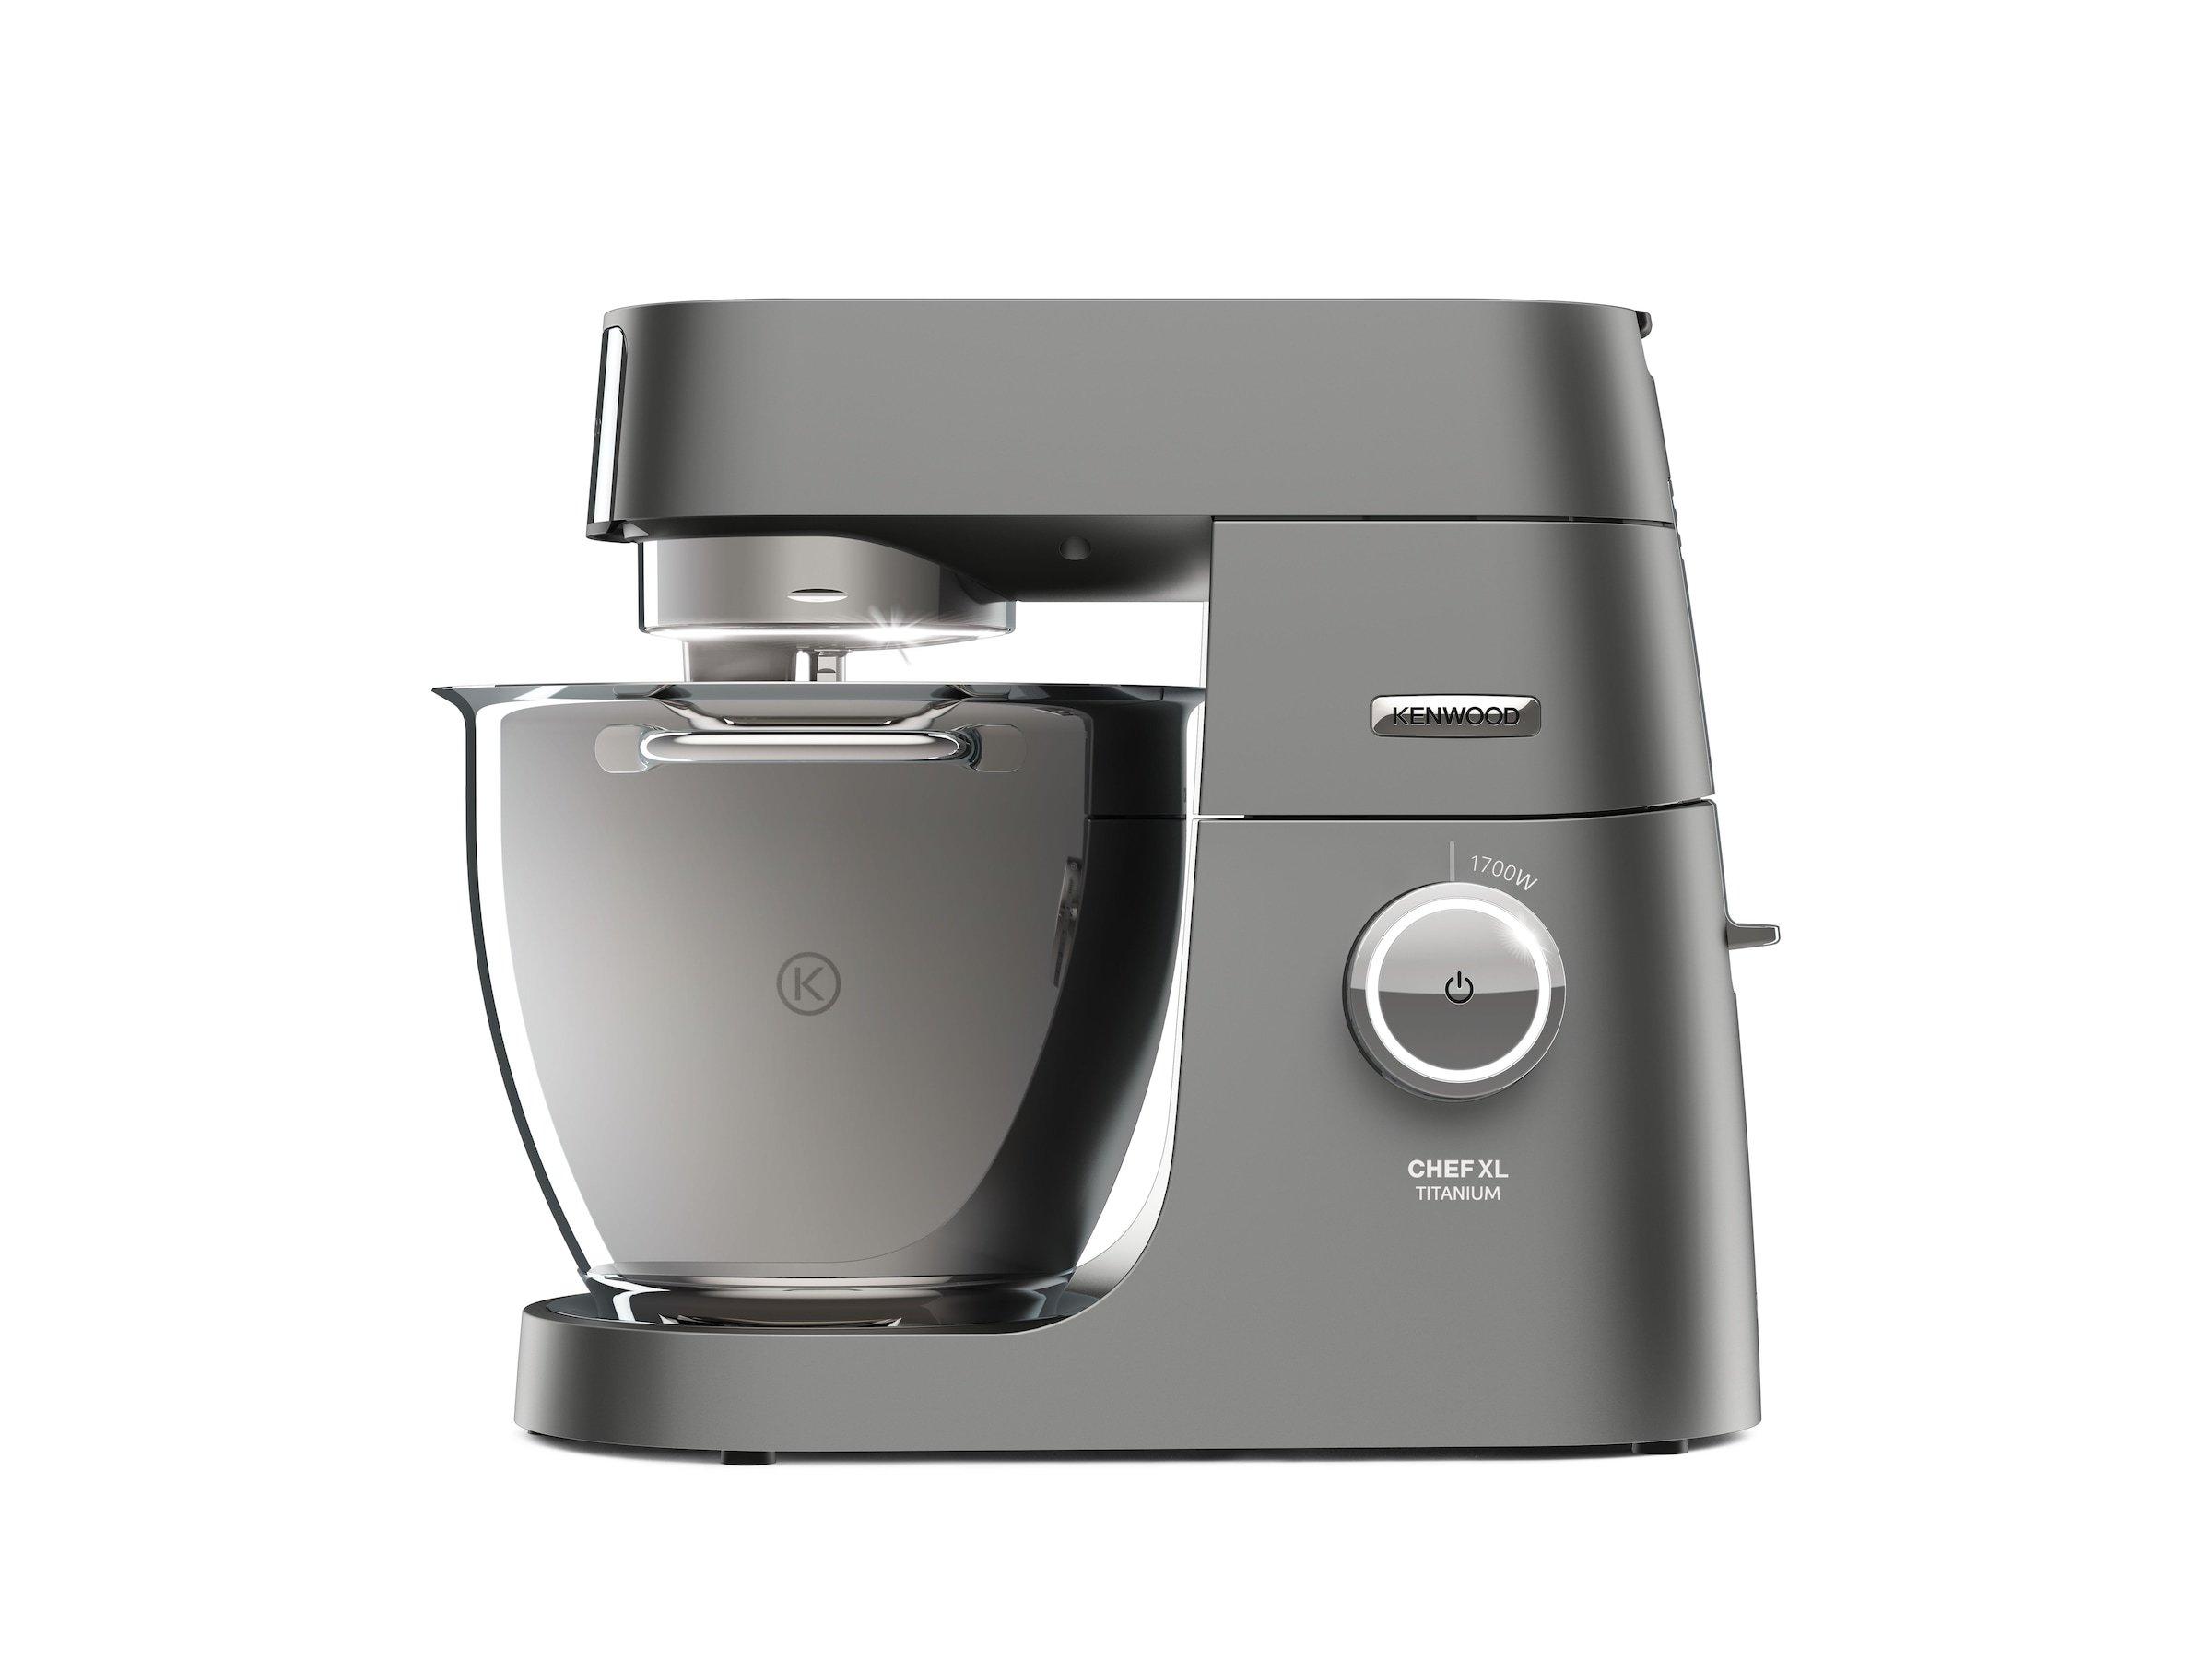 Kenwood - KVL8361S Chef Titanium XL Kitchen Appliance 1700W (E)